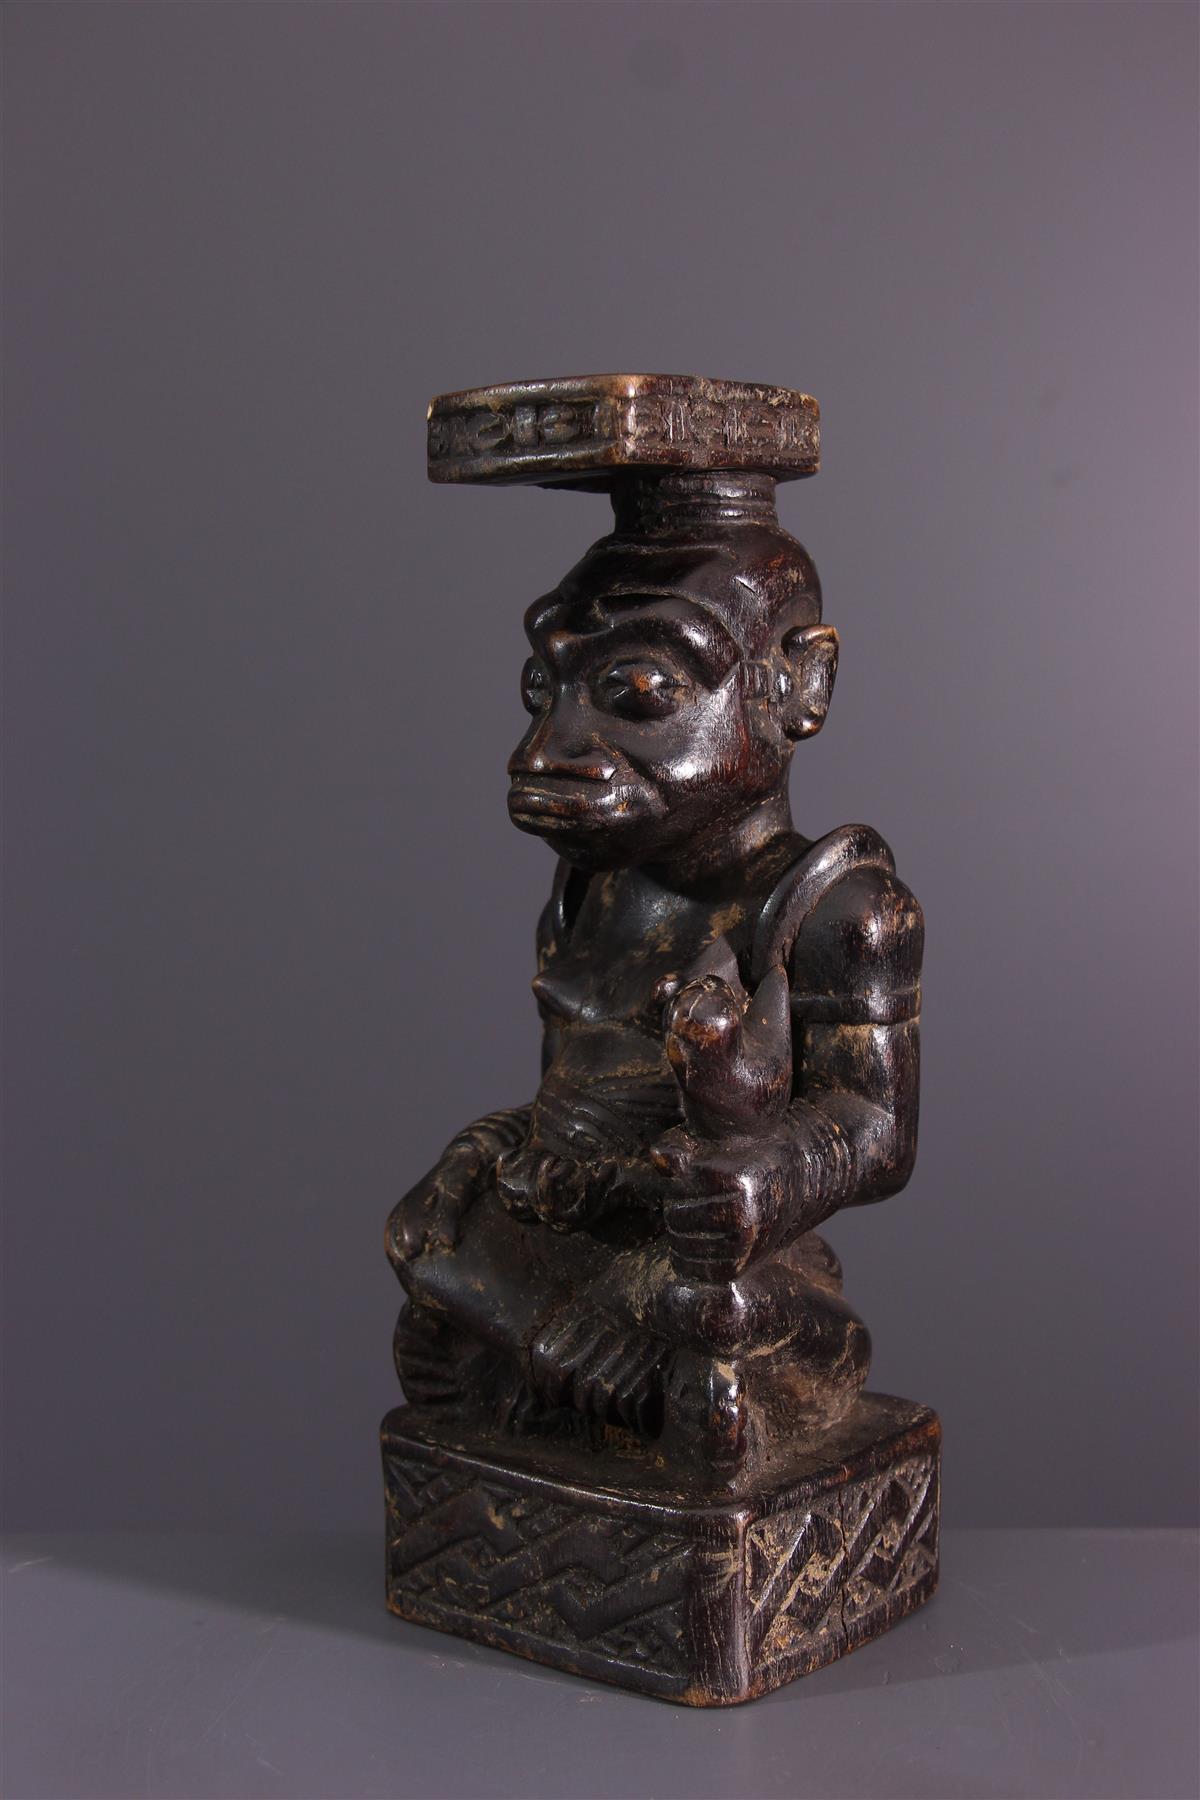 Statuette Ndop - Art africain